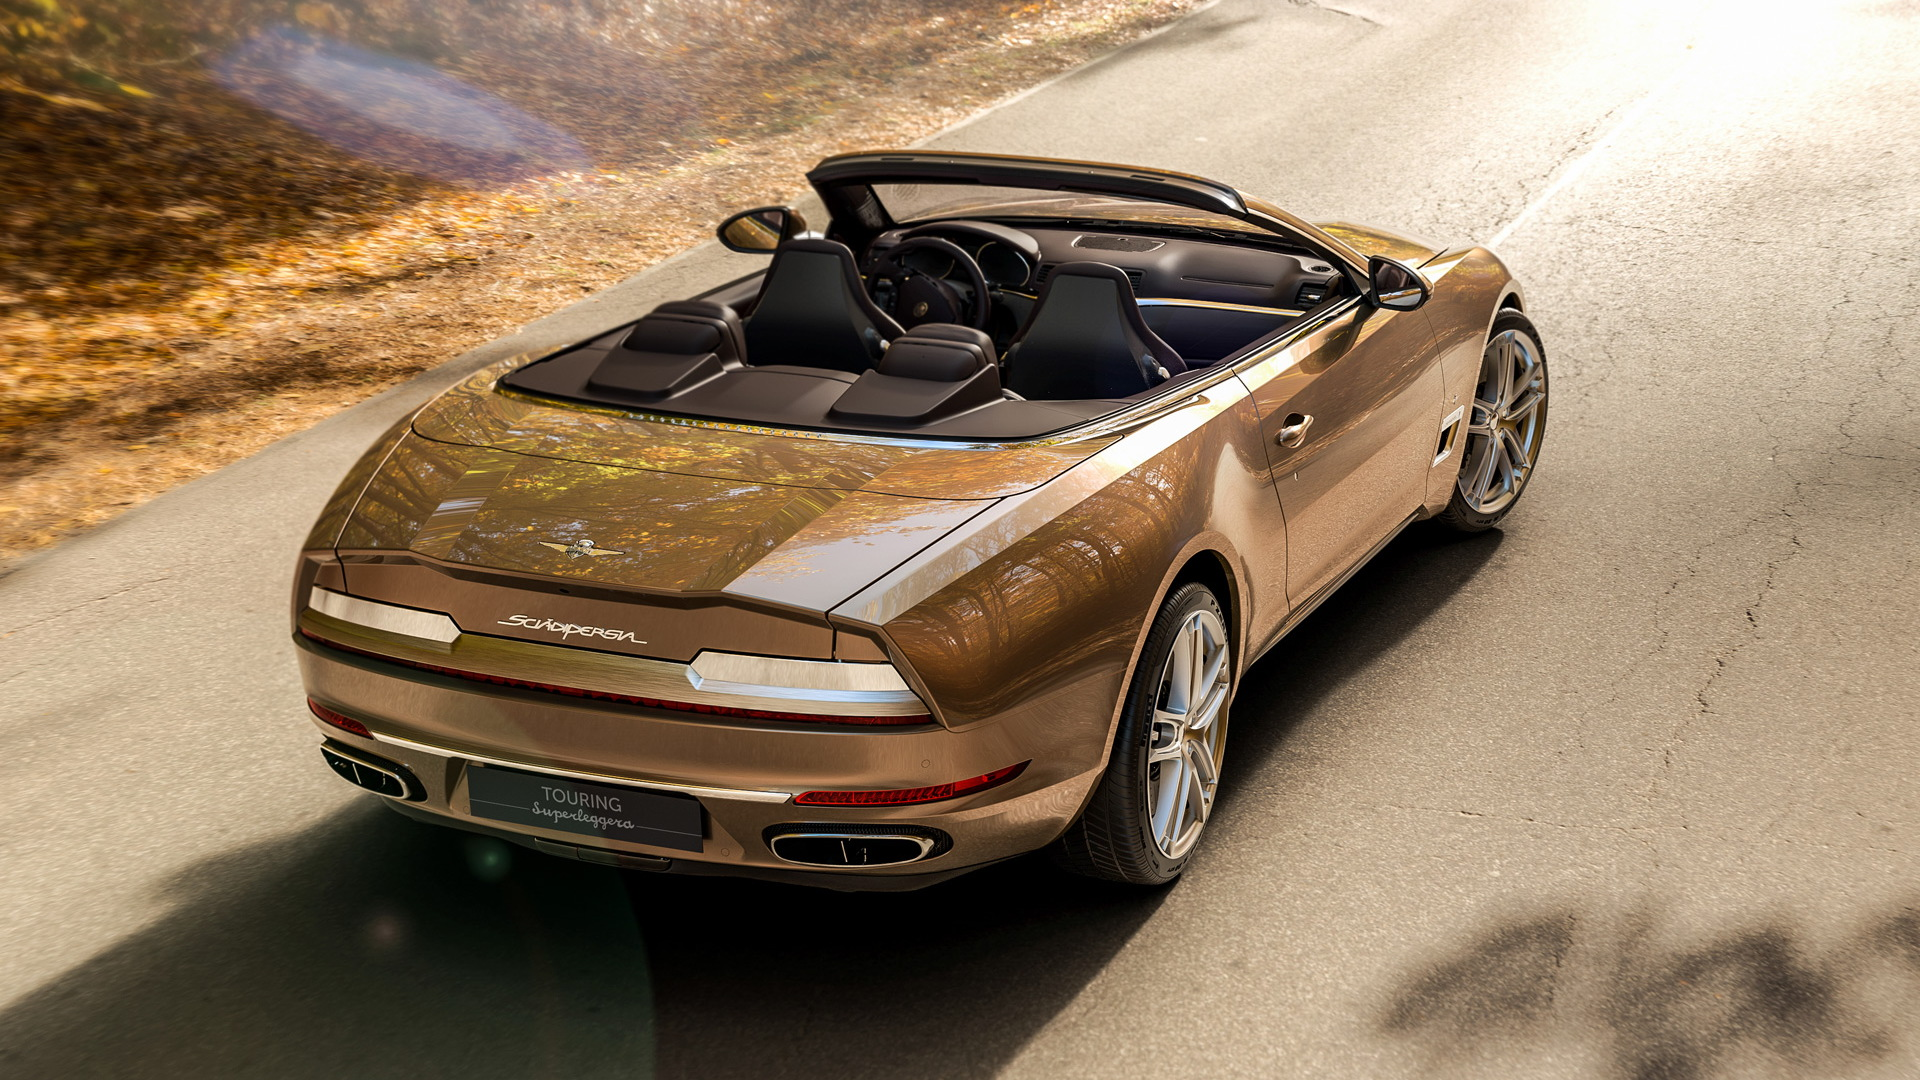 Carrozzeria Touring Superleggera Sciadipersia Cabriolet